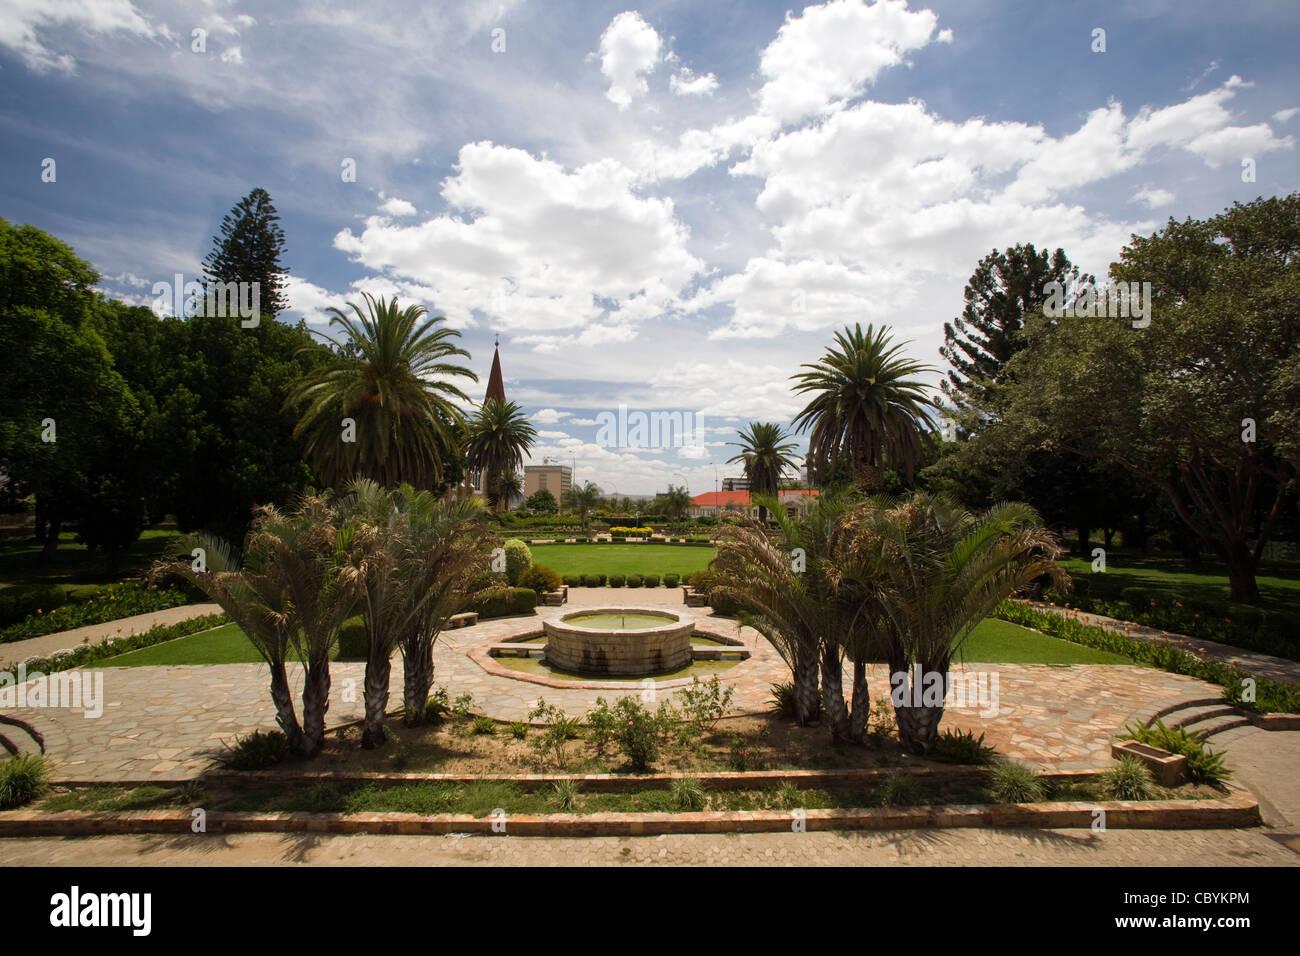 Parliament Garden - Windhoek - Namibia, Africa - Stock Image